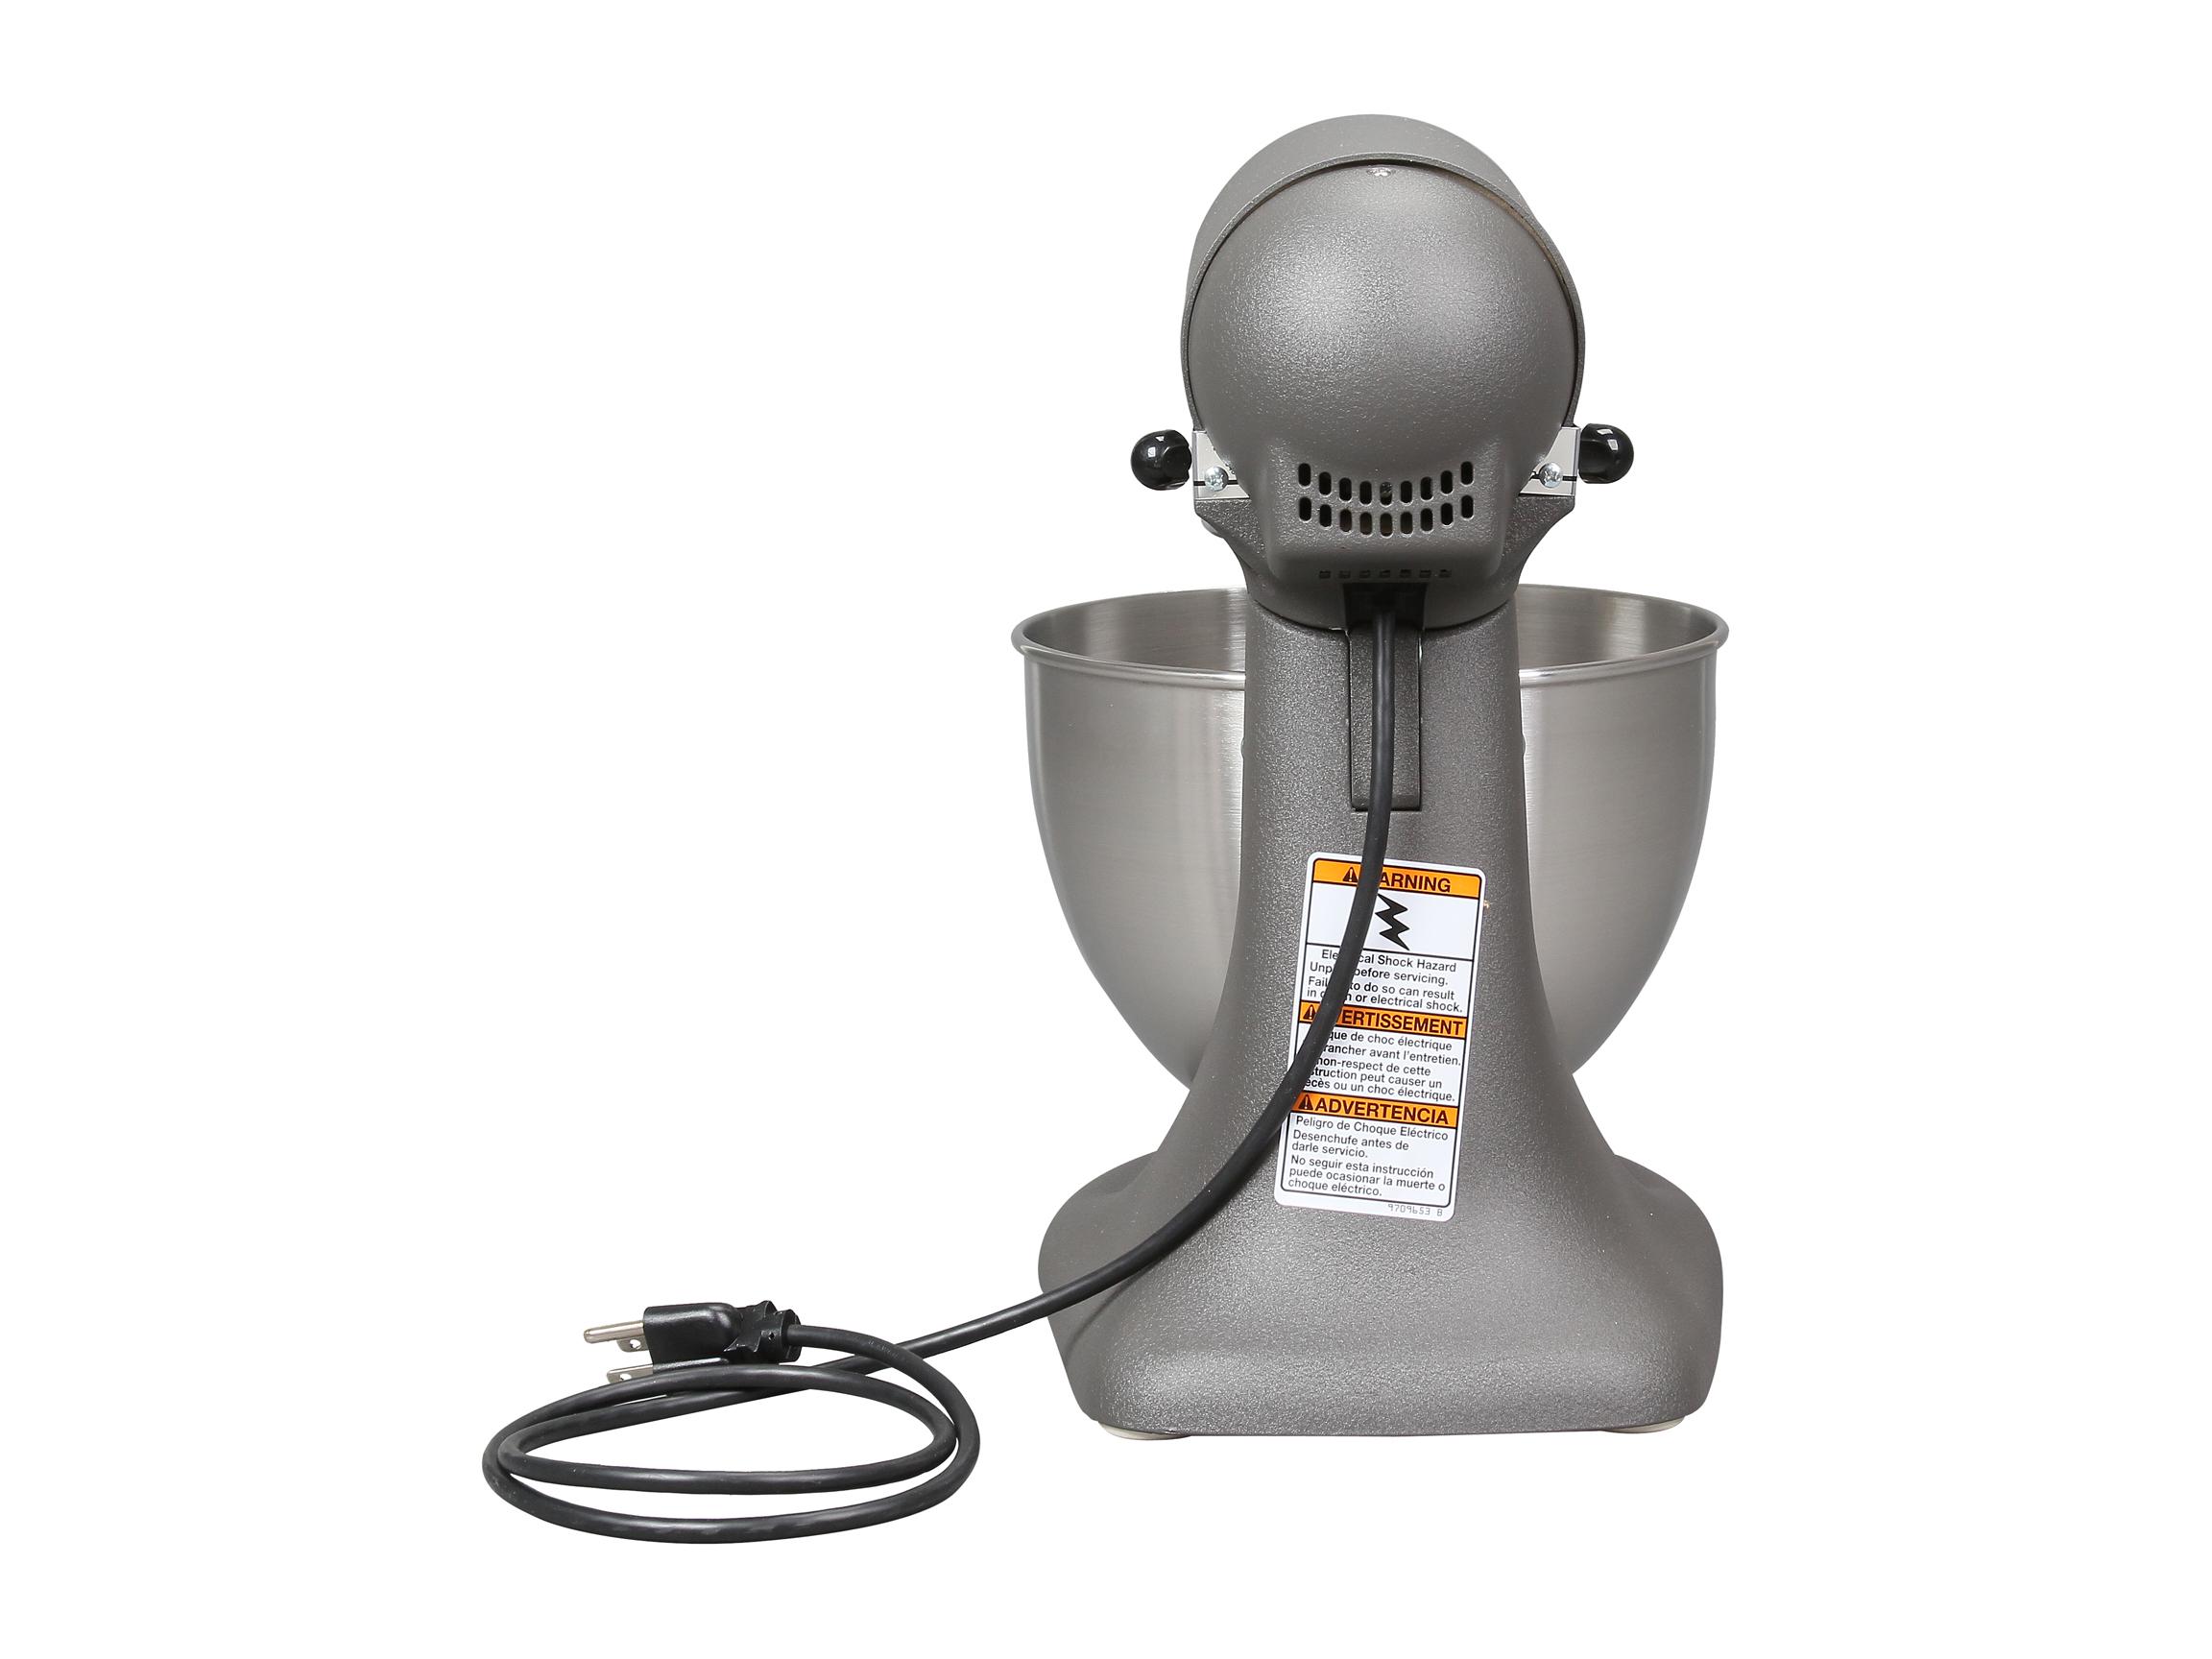 Kitchenaid Kitchenaid Ultra Power Mixer -> Kitchenaid Ultra Power Hand Mixer